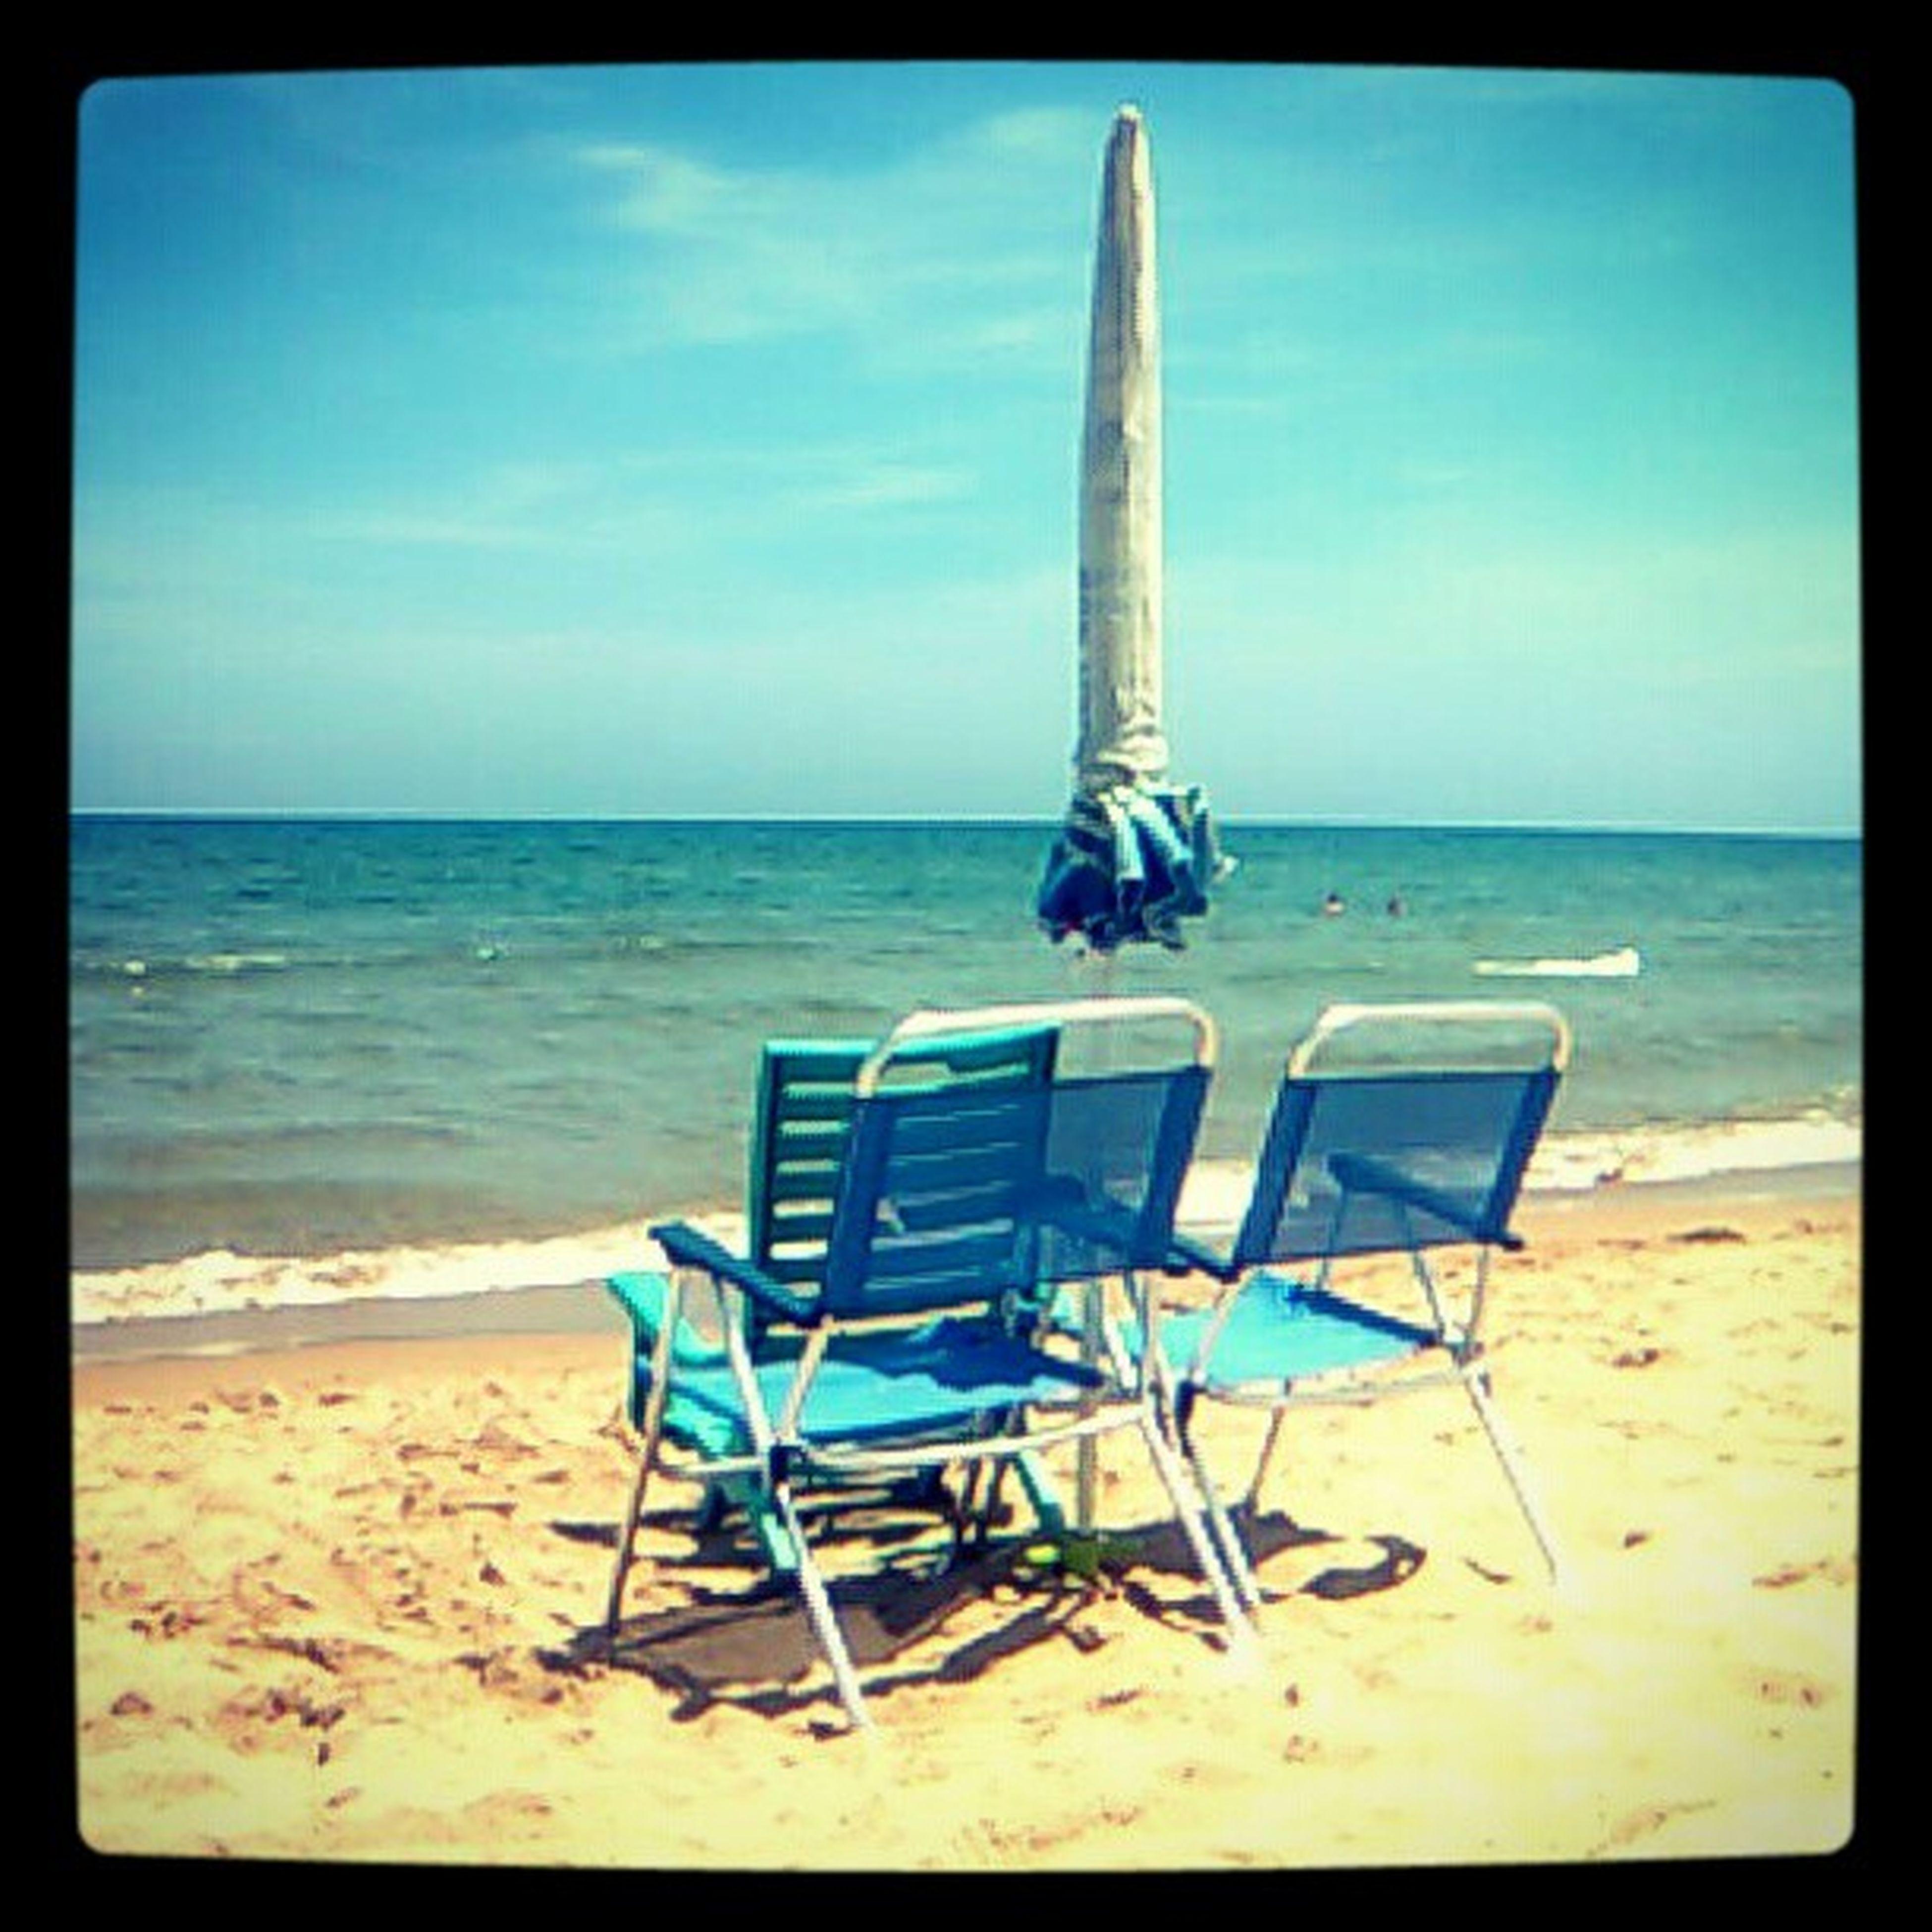 I want my summer back! Wintercheating Sea4ever